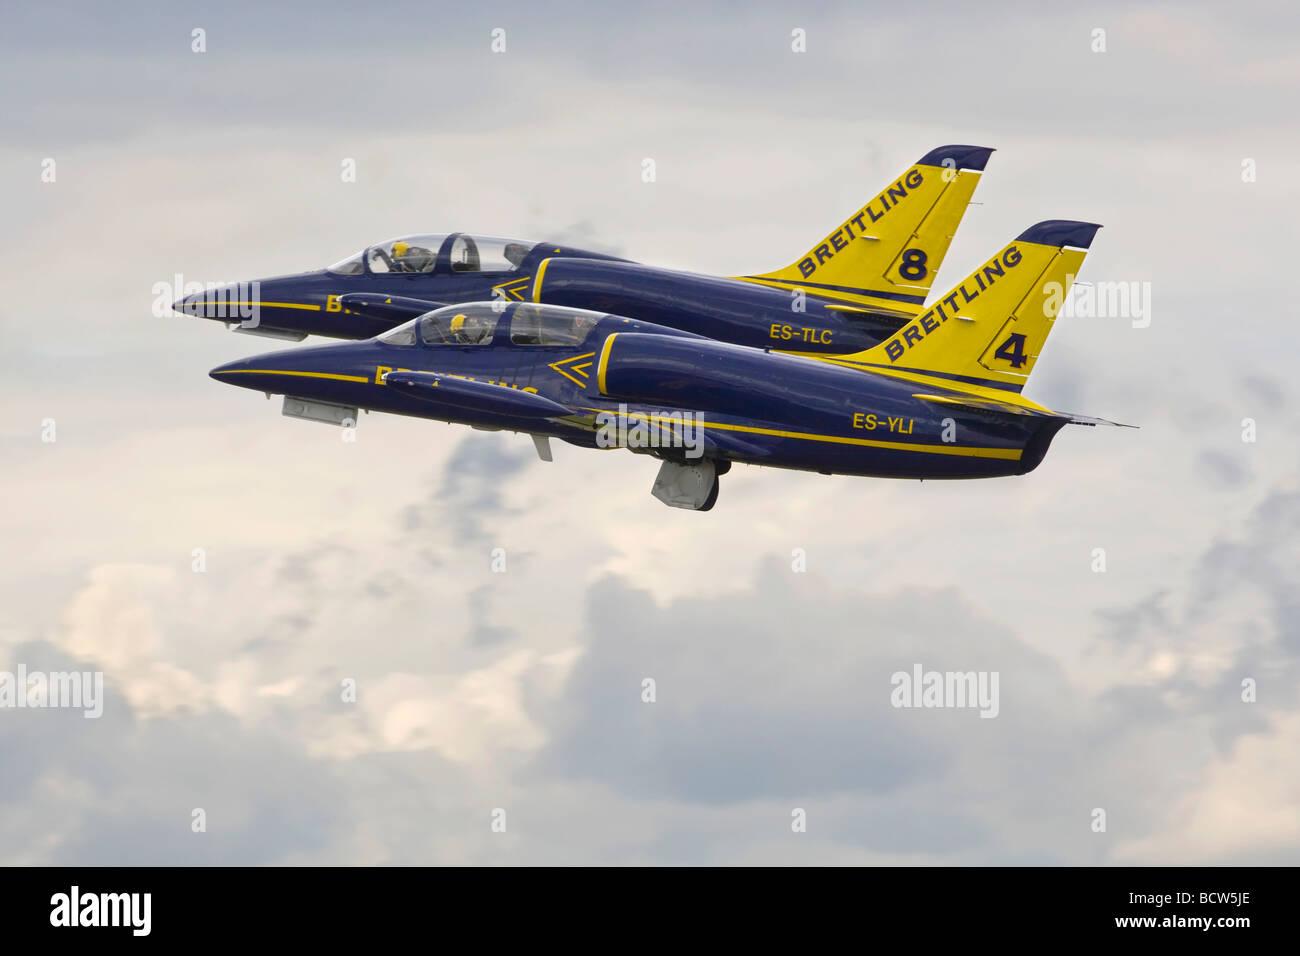 The Aero L39 Albatross s of the Breitling aerobatic team - Stock Image